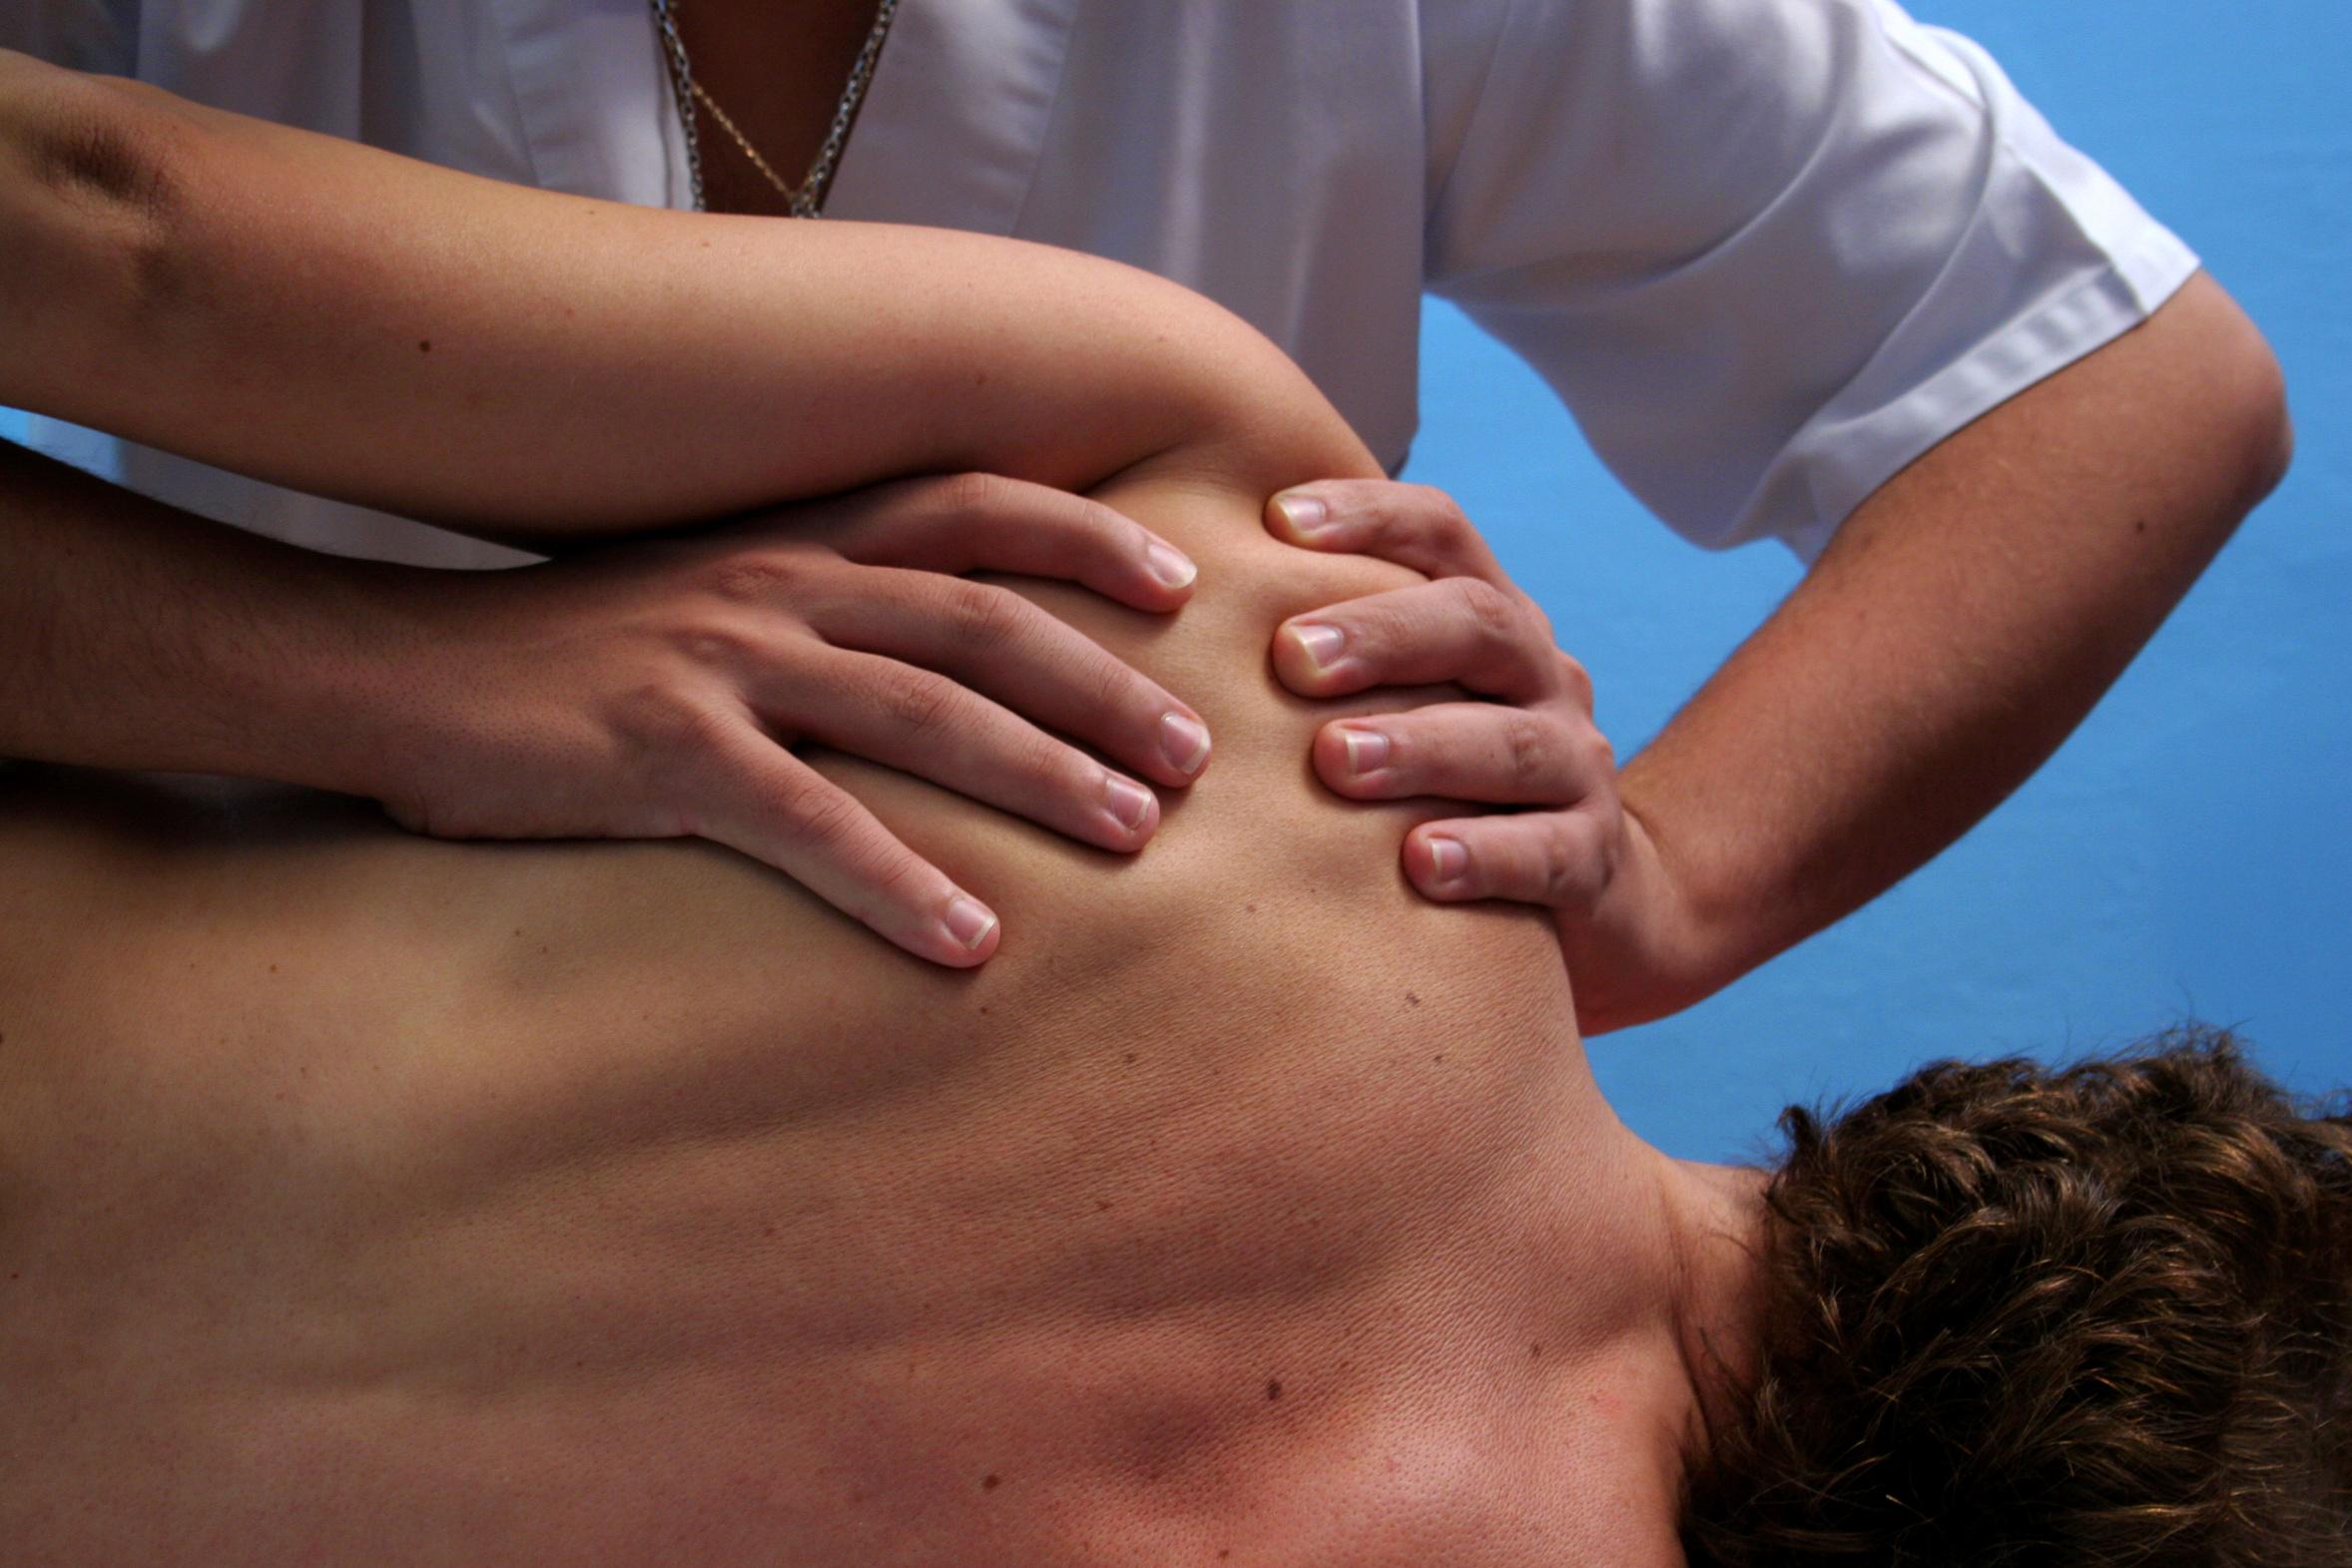 osteopata roma monte sacro silvia vitale - sistema strutturale